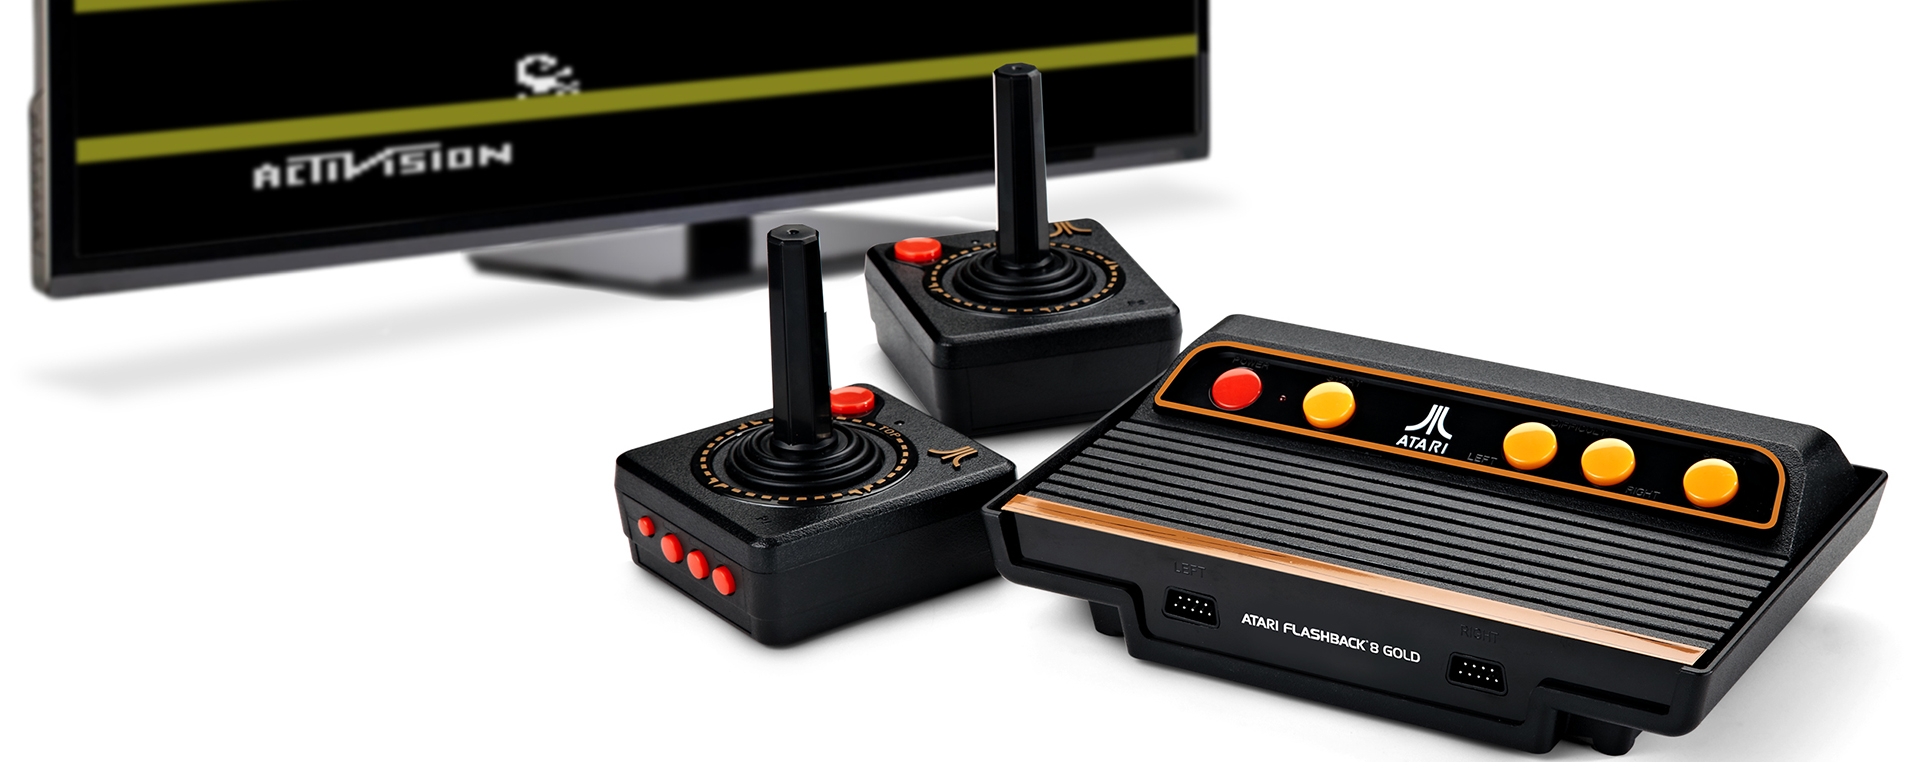 Go Retro With The Atari Flashback 8 Gold Activision Edition